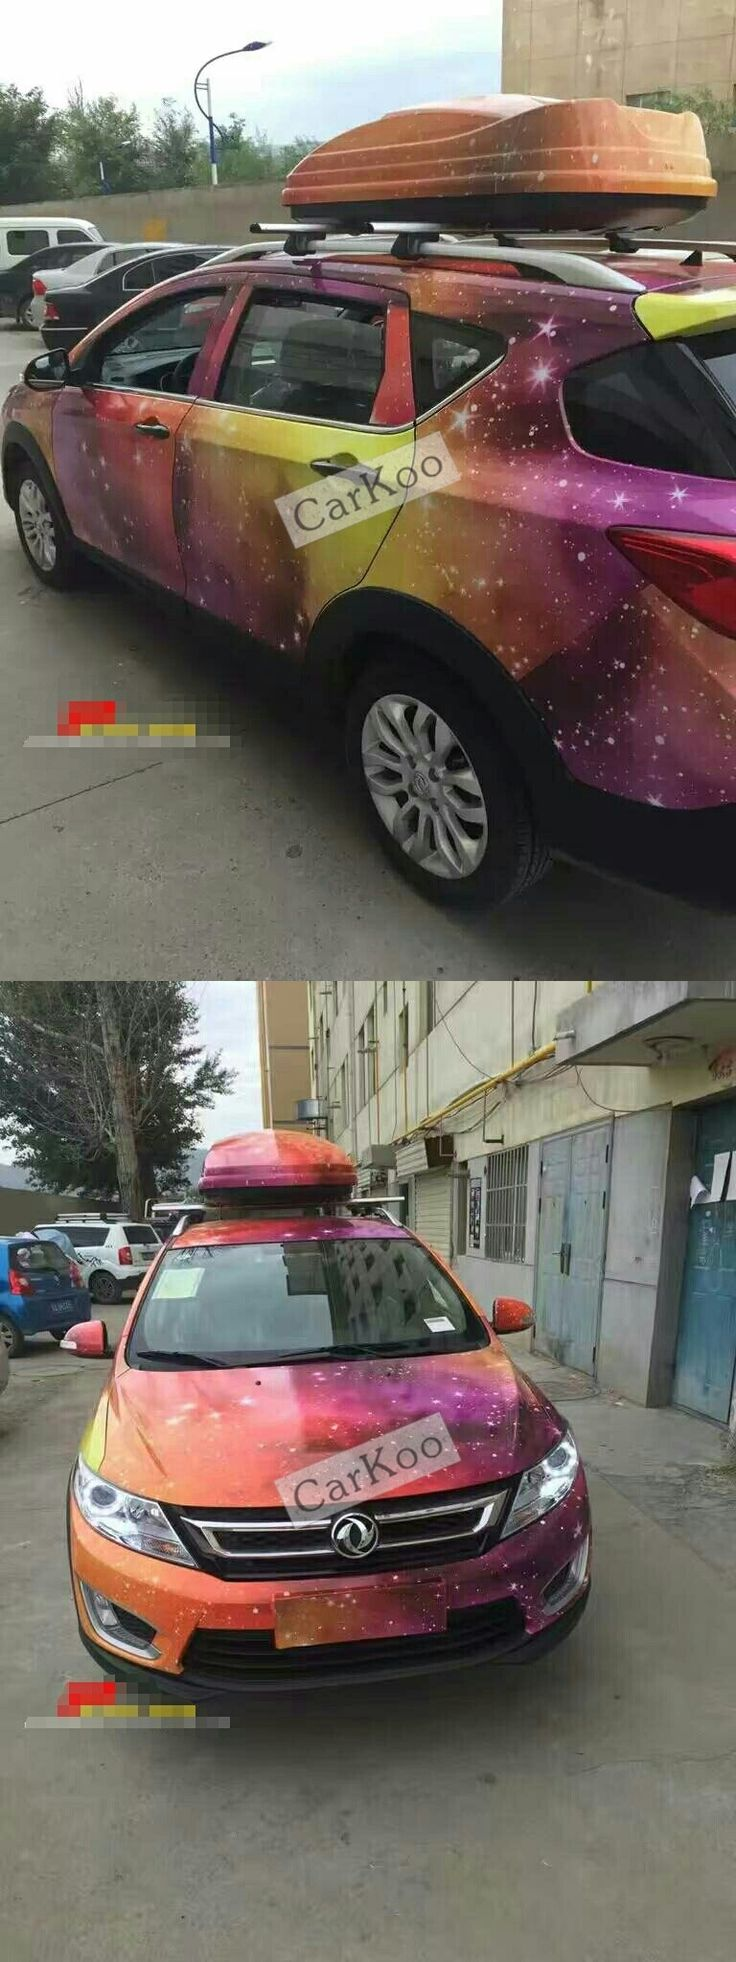 Starry sky custom car sticker bomb Camo Vinyl Wrap Car Wrap With Air Release bomb sticker Car Body Sticker